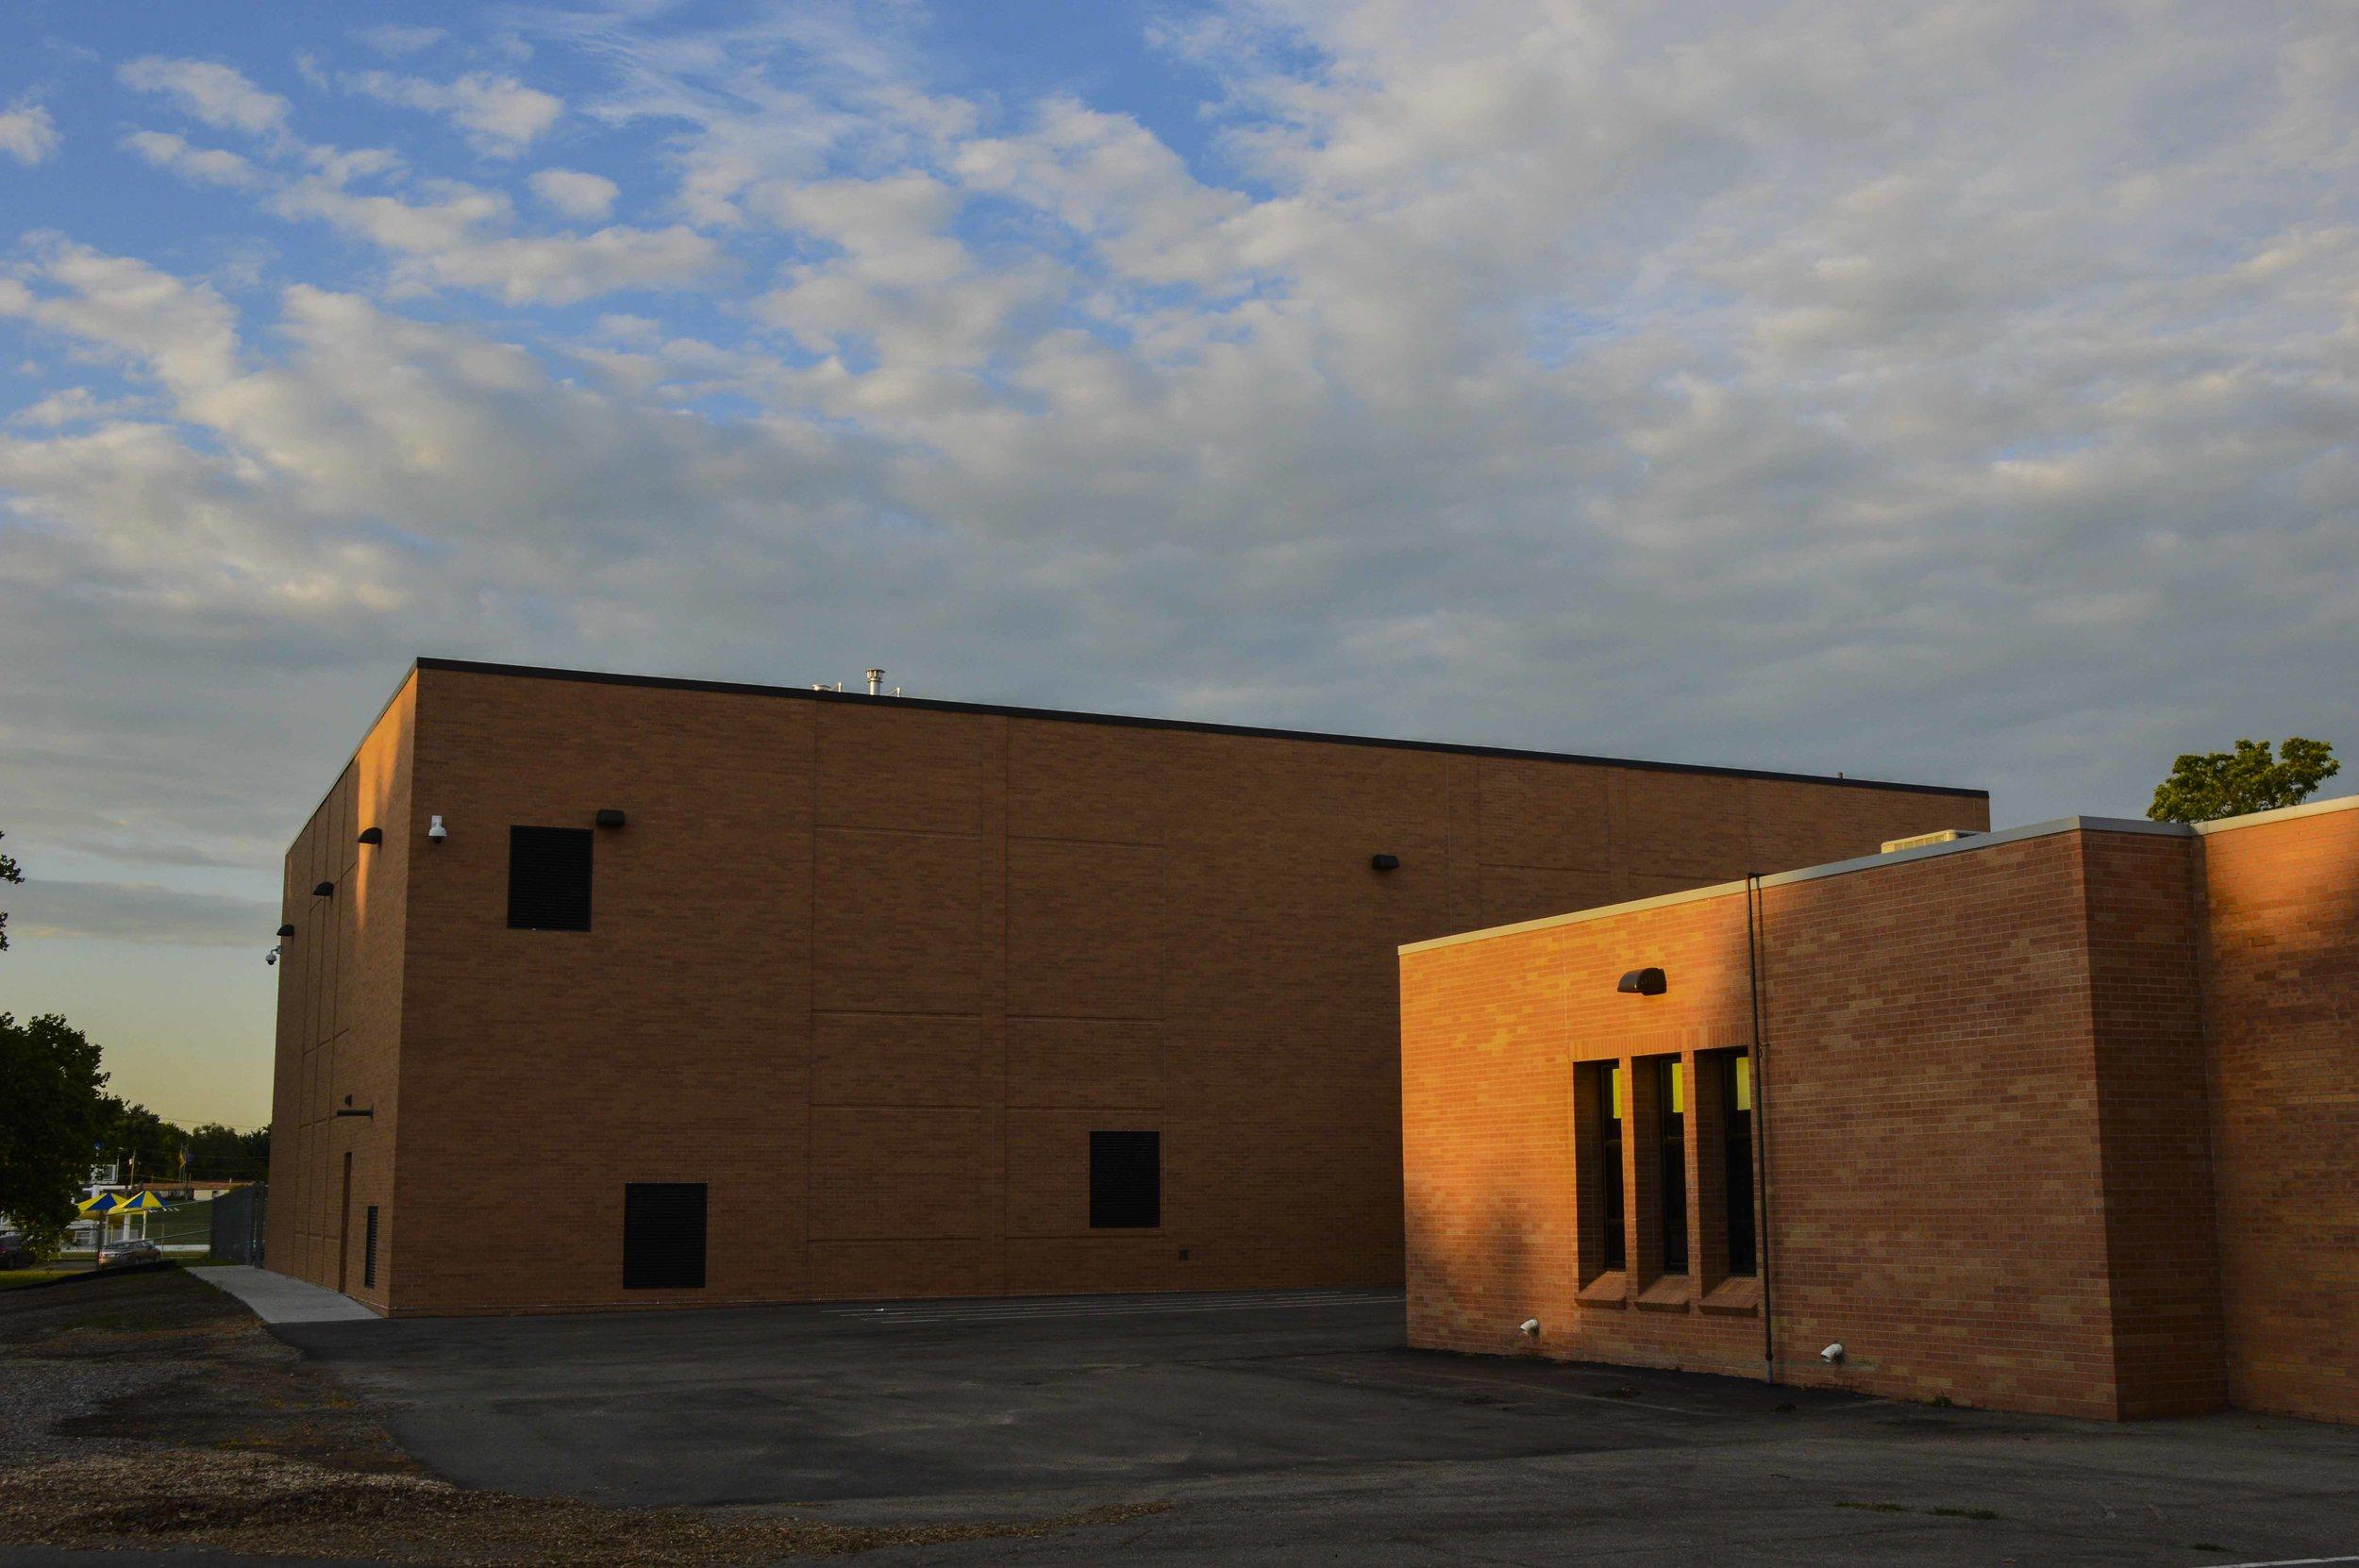 Quincy Elementary   Client: USD 501 Topeka Public Schools Architect: TreanorHL